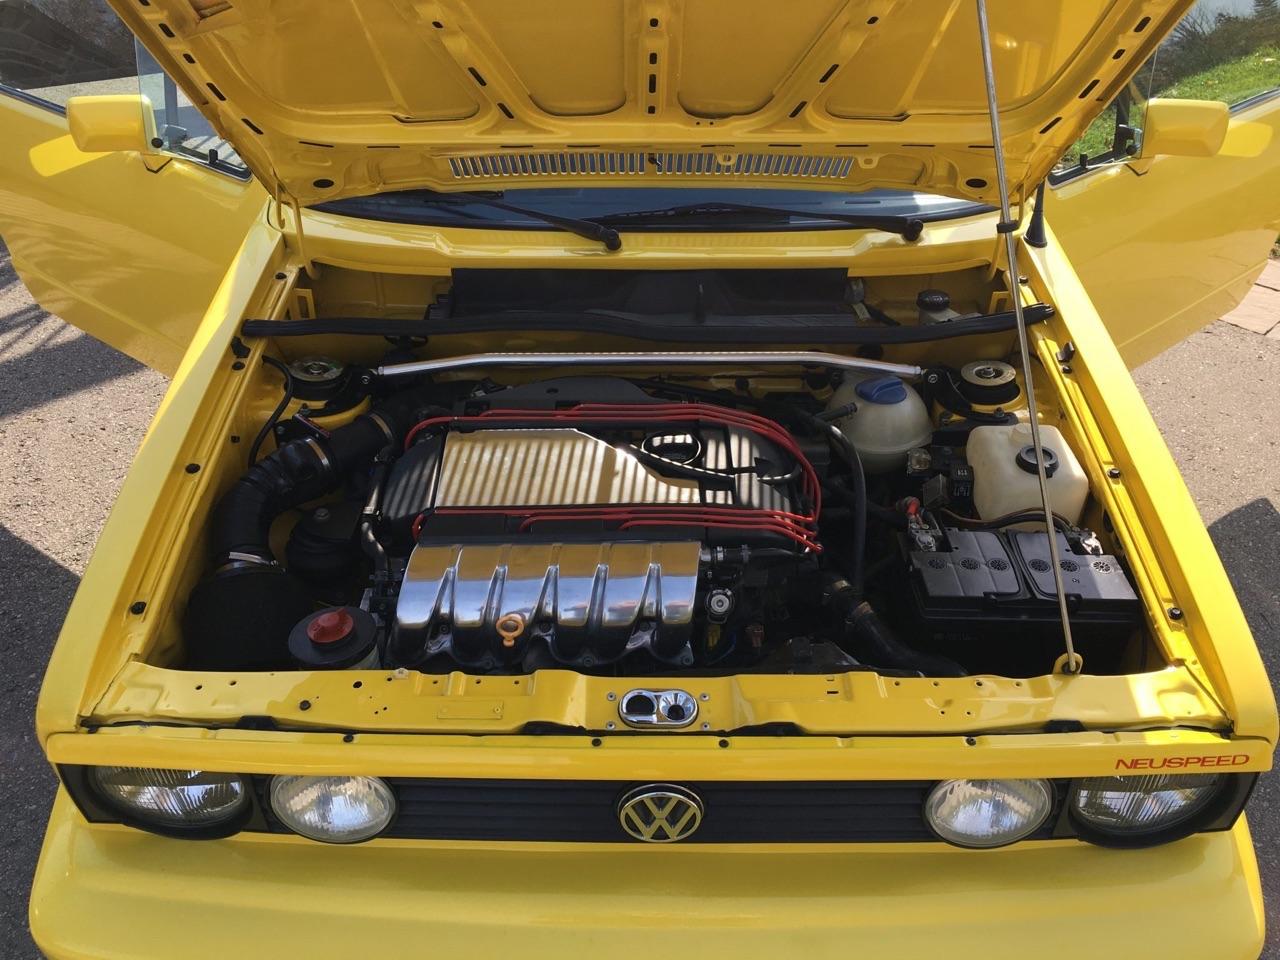 '87 VW Golf Cab VR6... Booyaka, booyaka ! 25